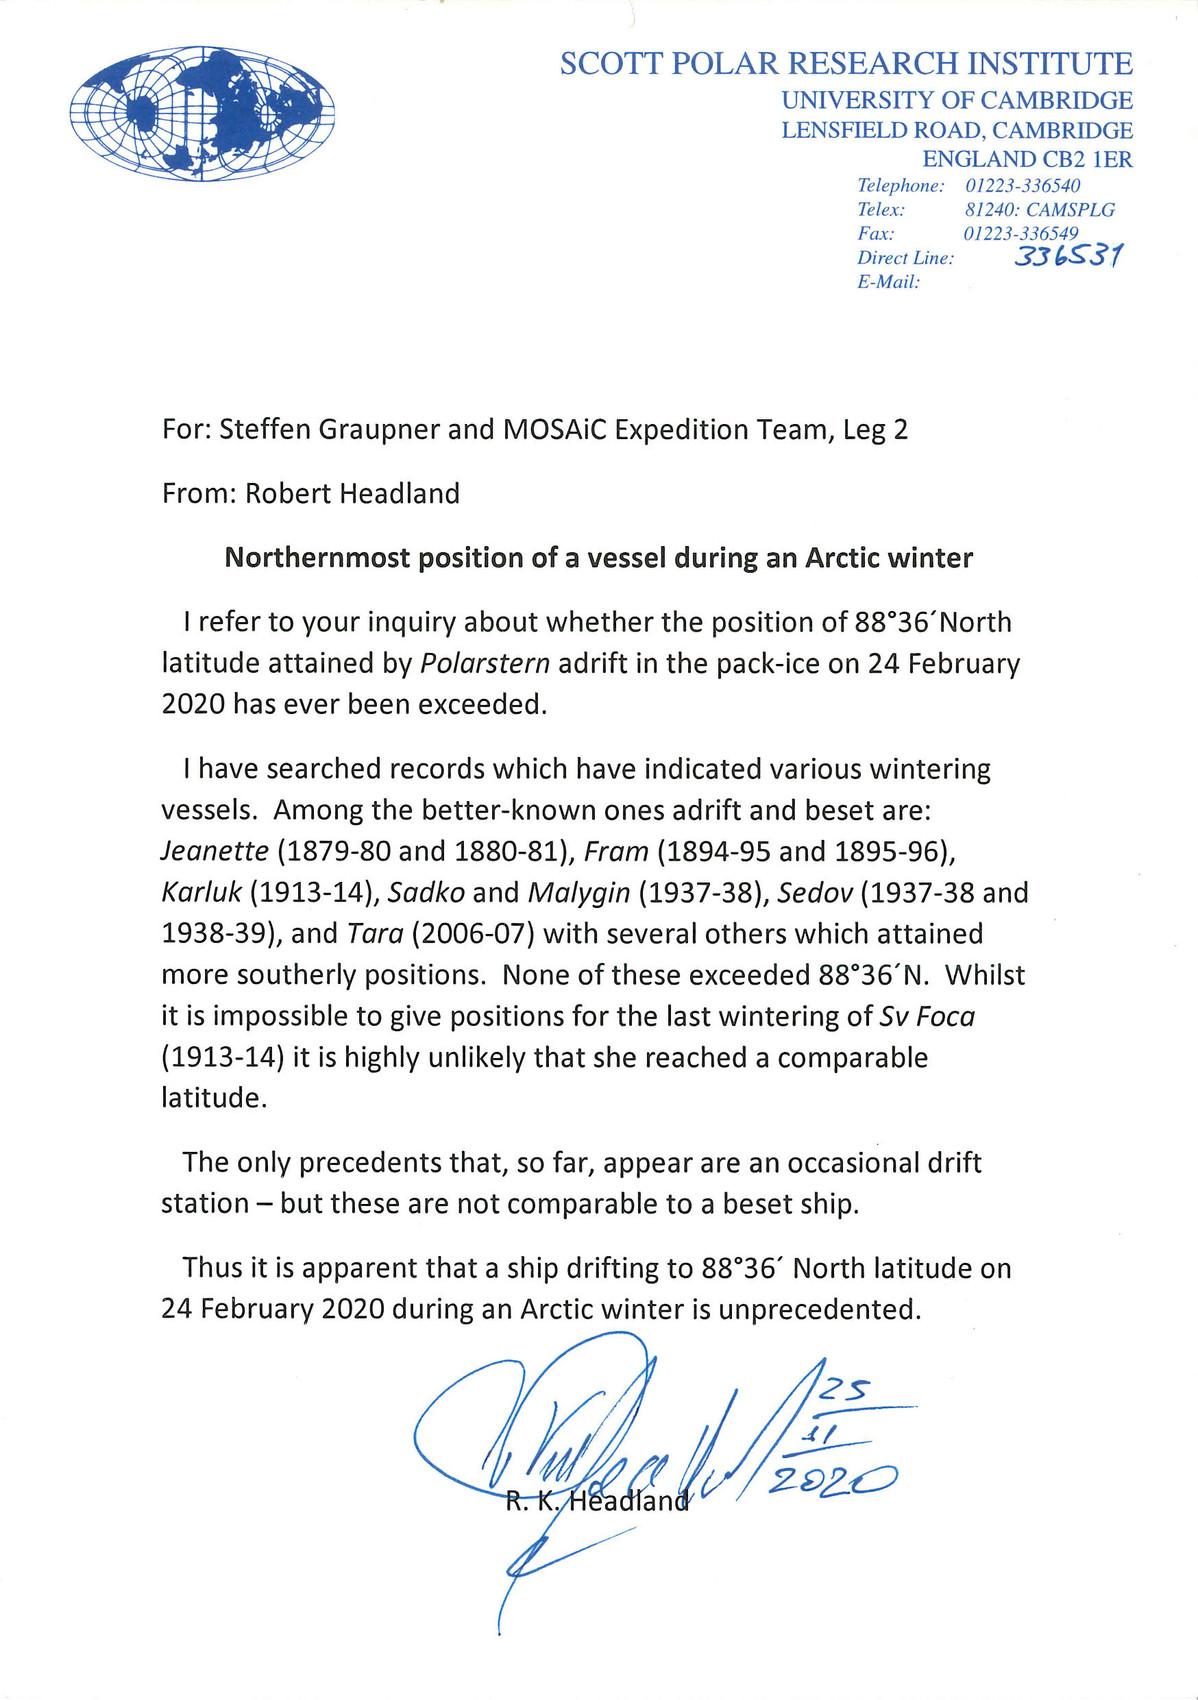 Farthest North Polarstern - SPRI - Robert Headland